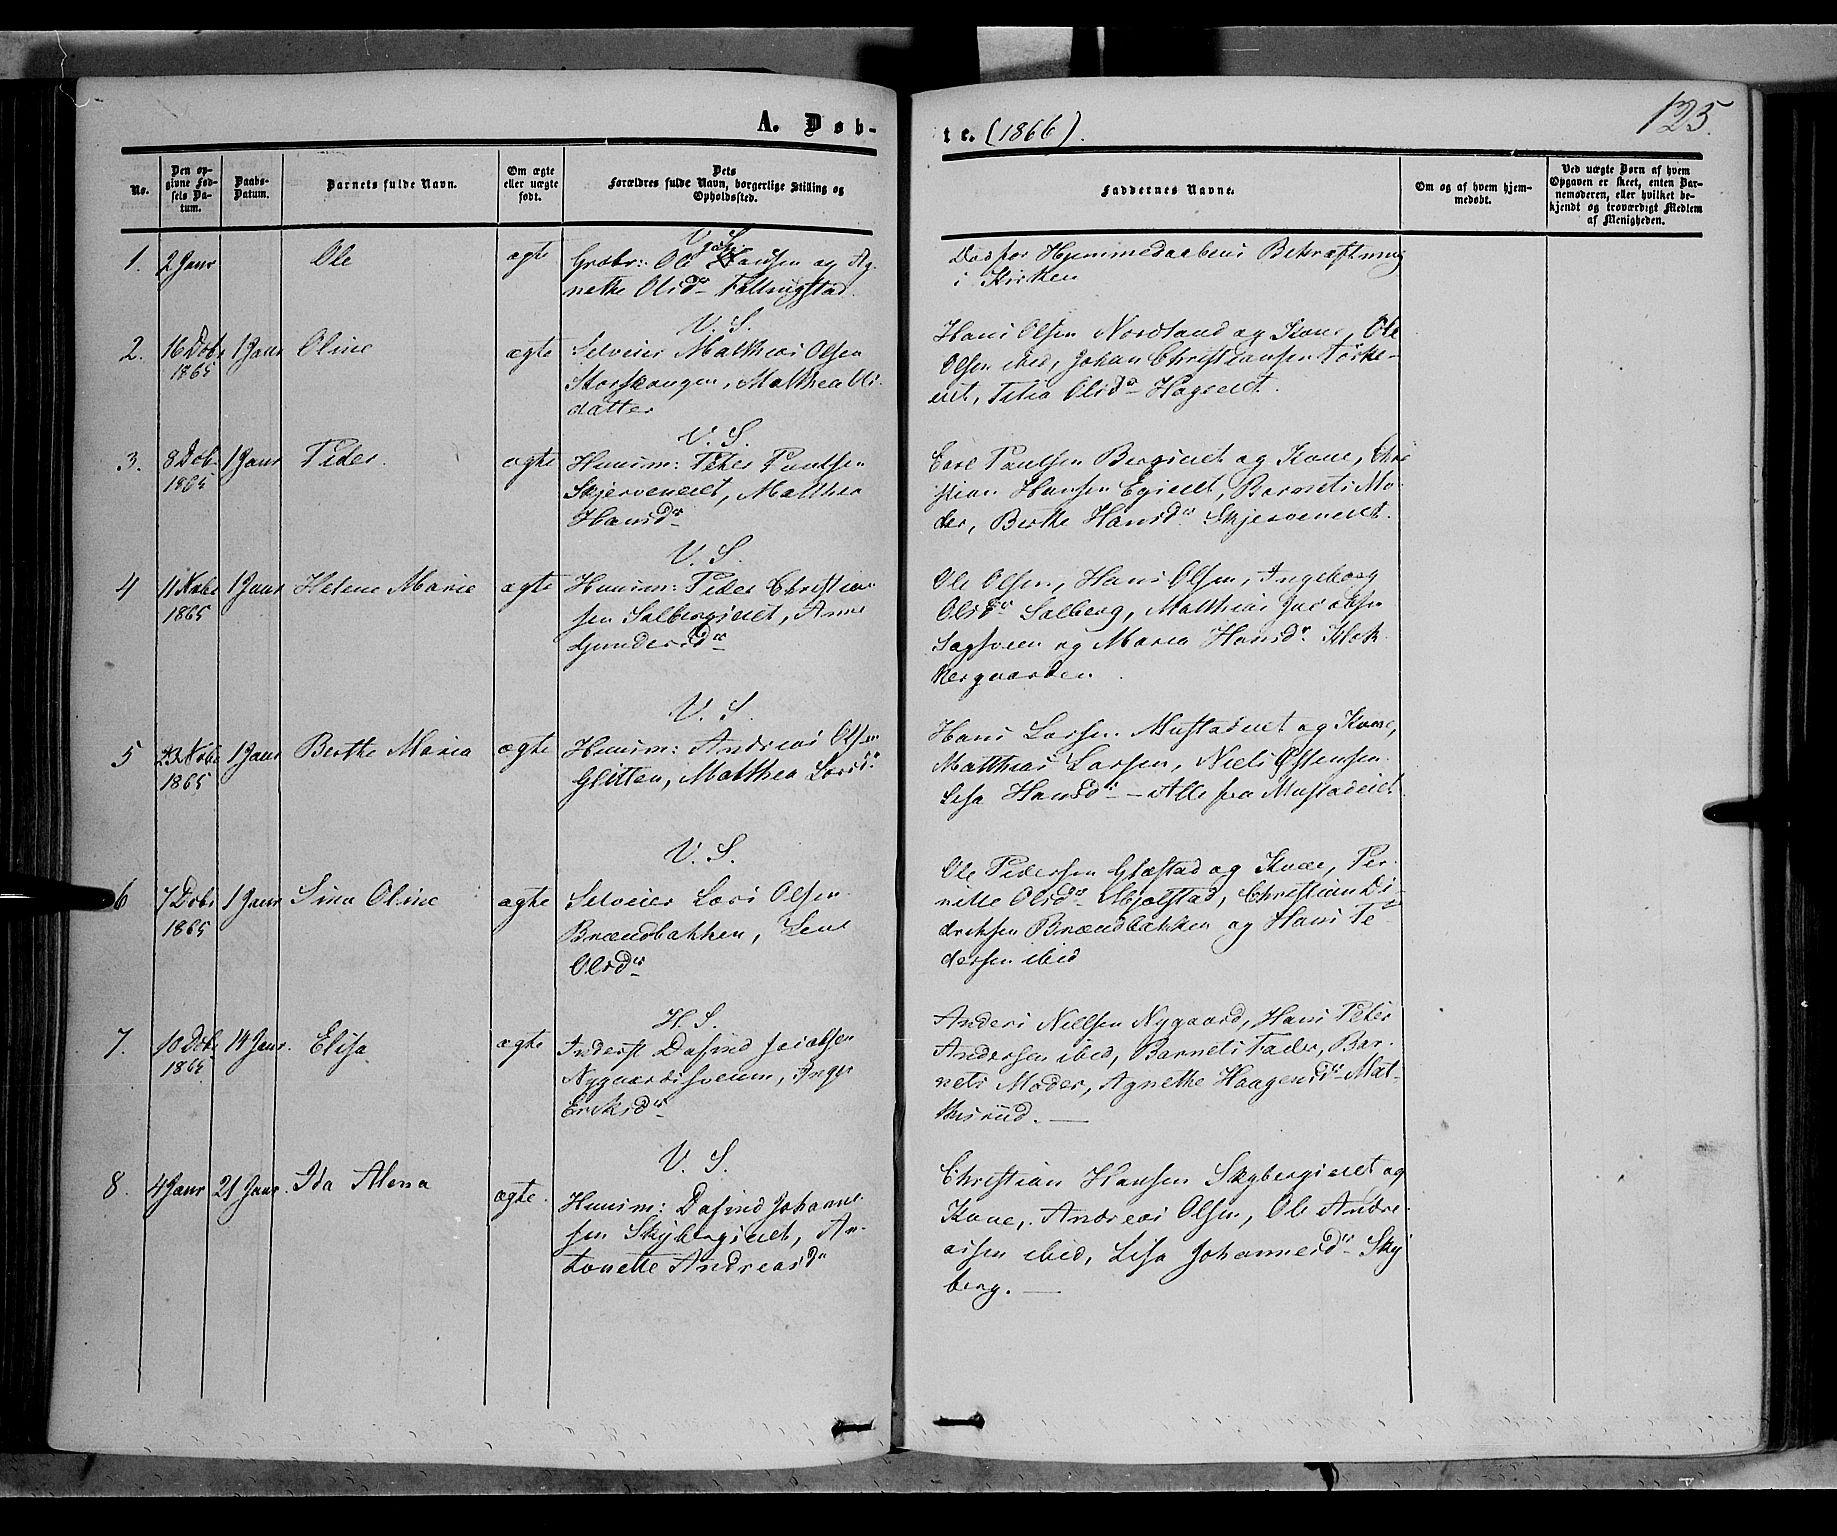 SAH, Vardal prestekontor, H/Ha/Haa/L0006: Ministerialbok nr. 6, 1854-1866, s. 125